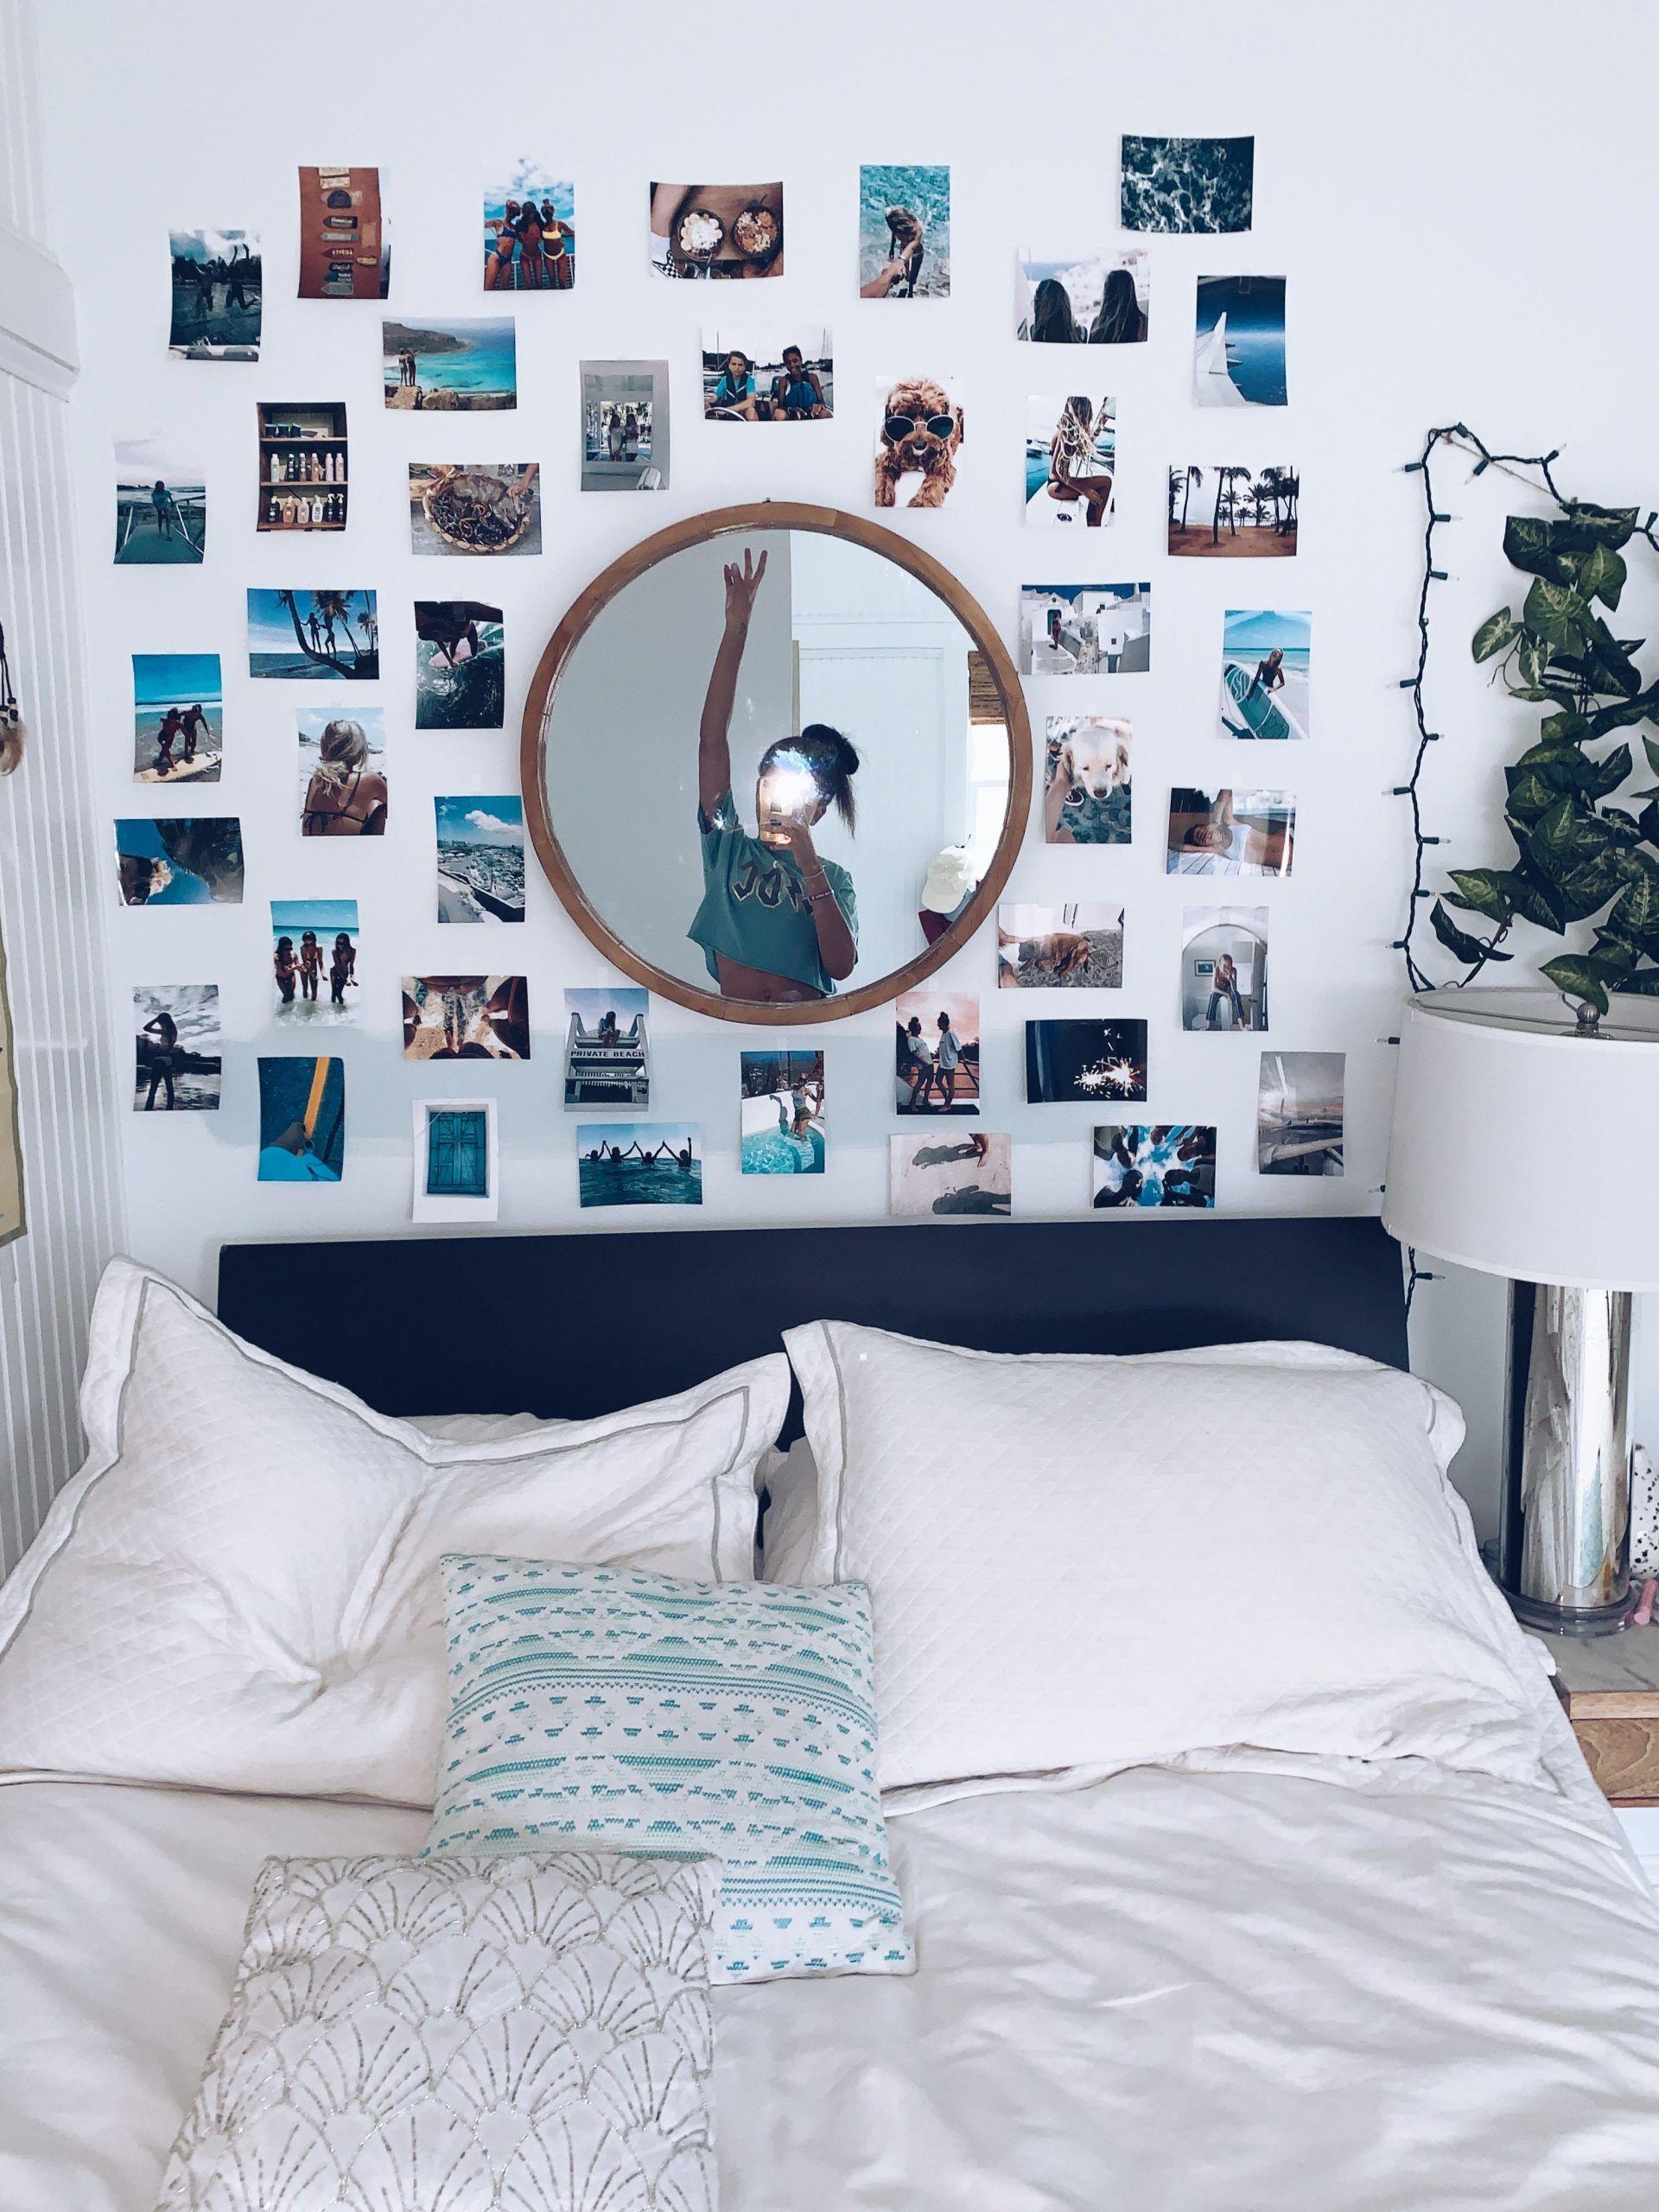 Pinterest Loveglo3 Loveglo3 Pinterest Photo Walls Bedroom Dorm Room Decor Redecorate Bedroom